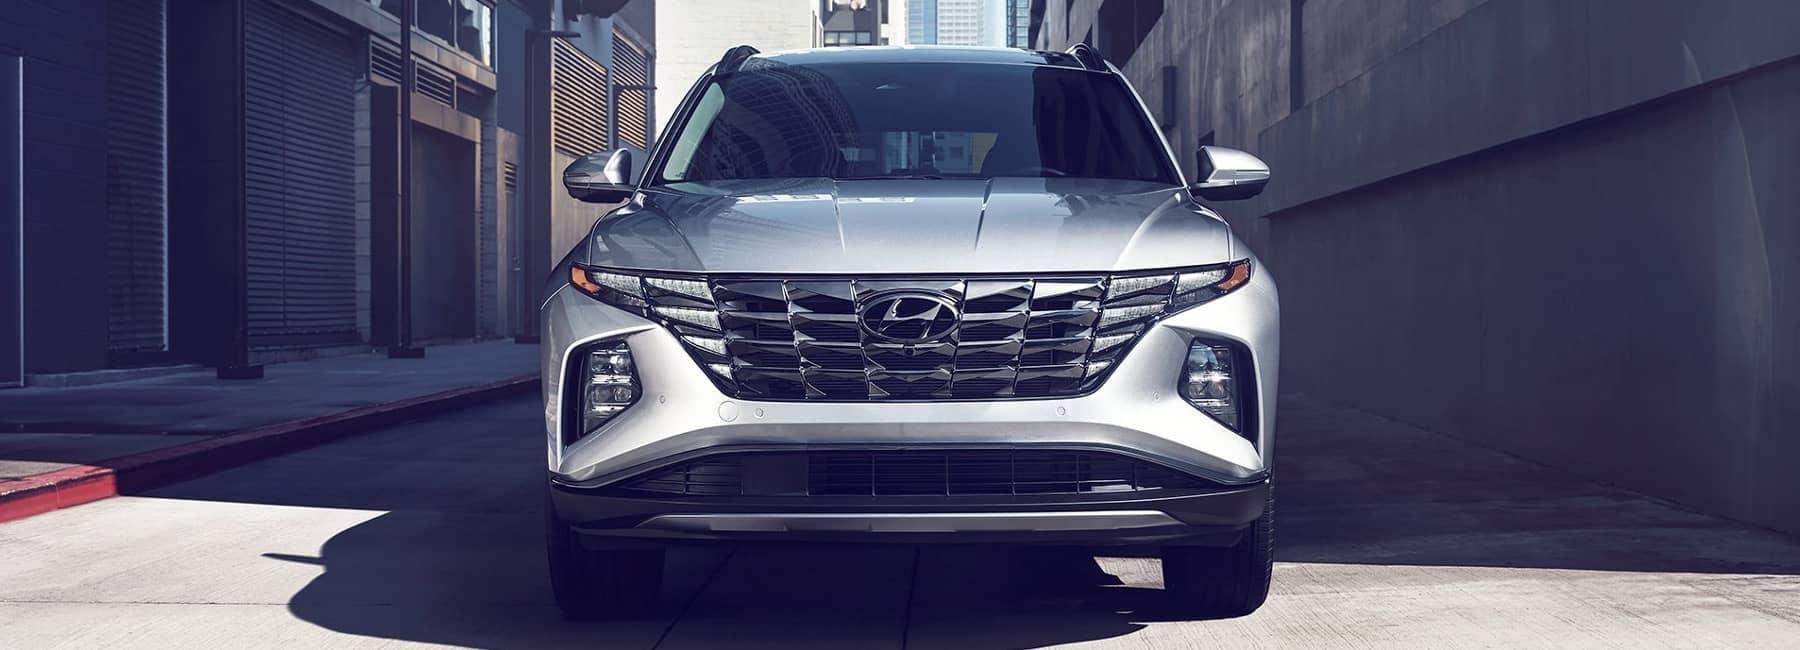 2022 Silver Hyundai Tucson front view